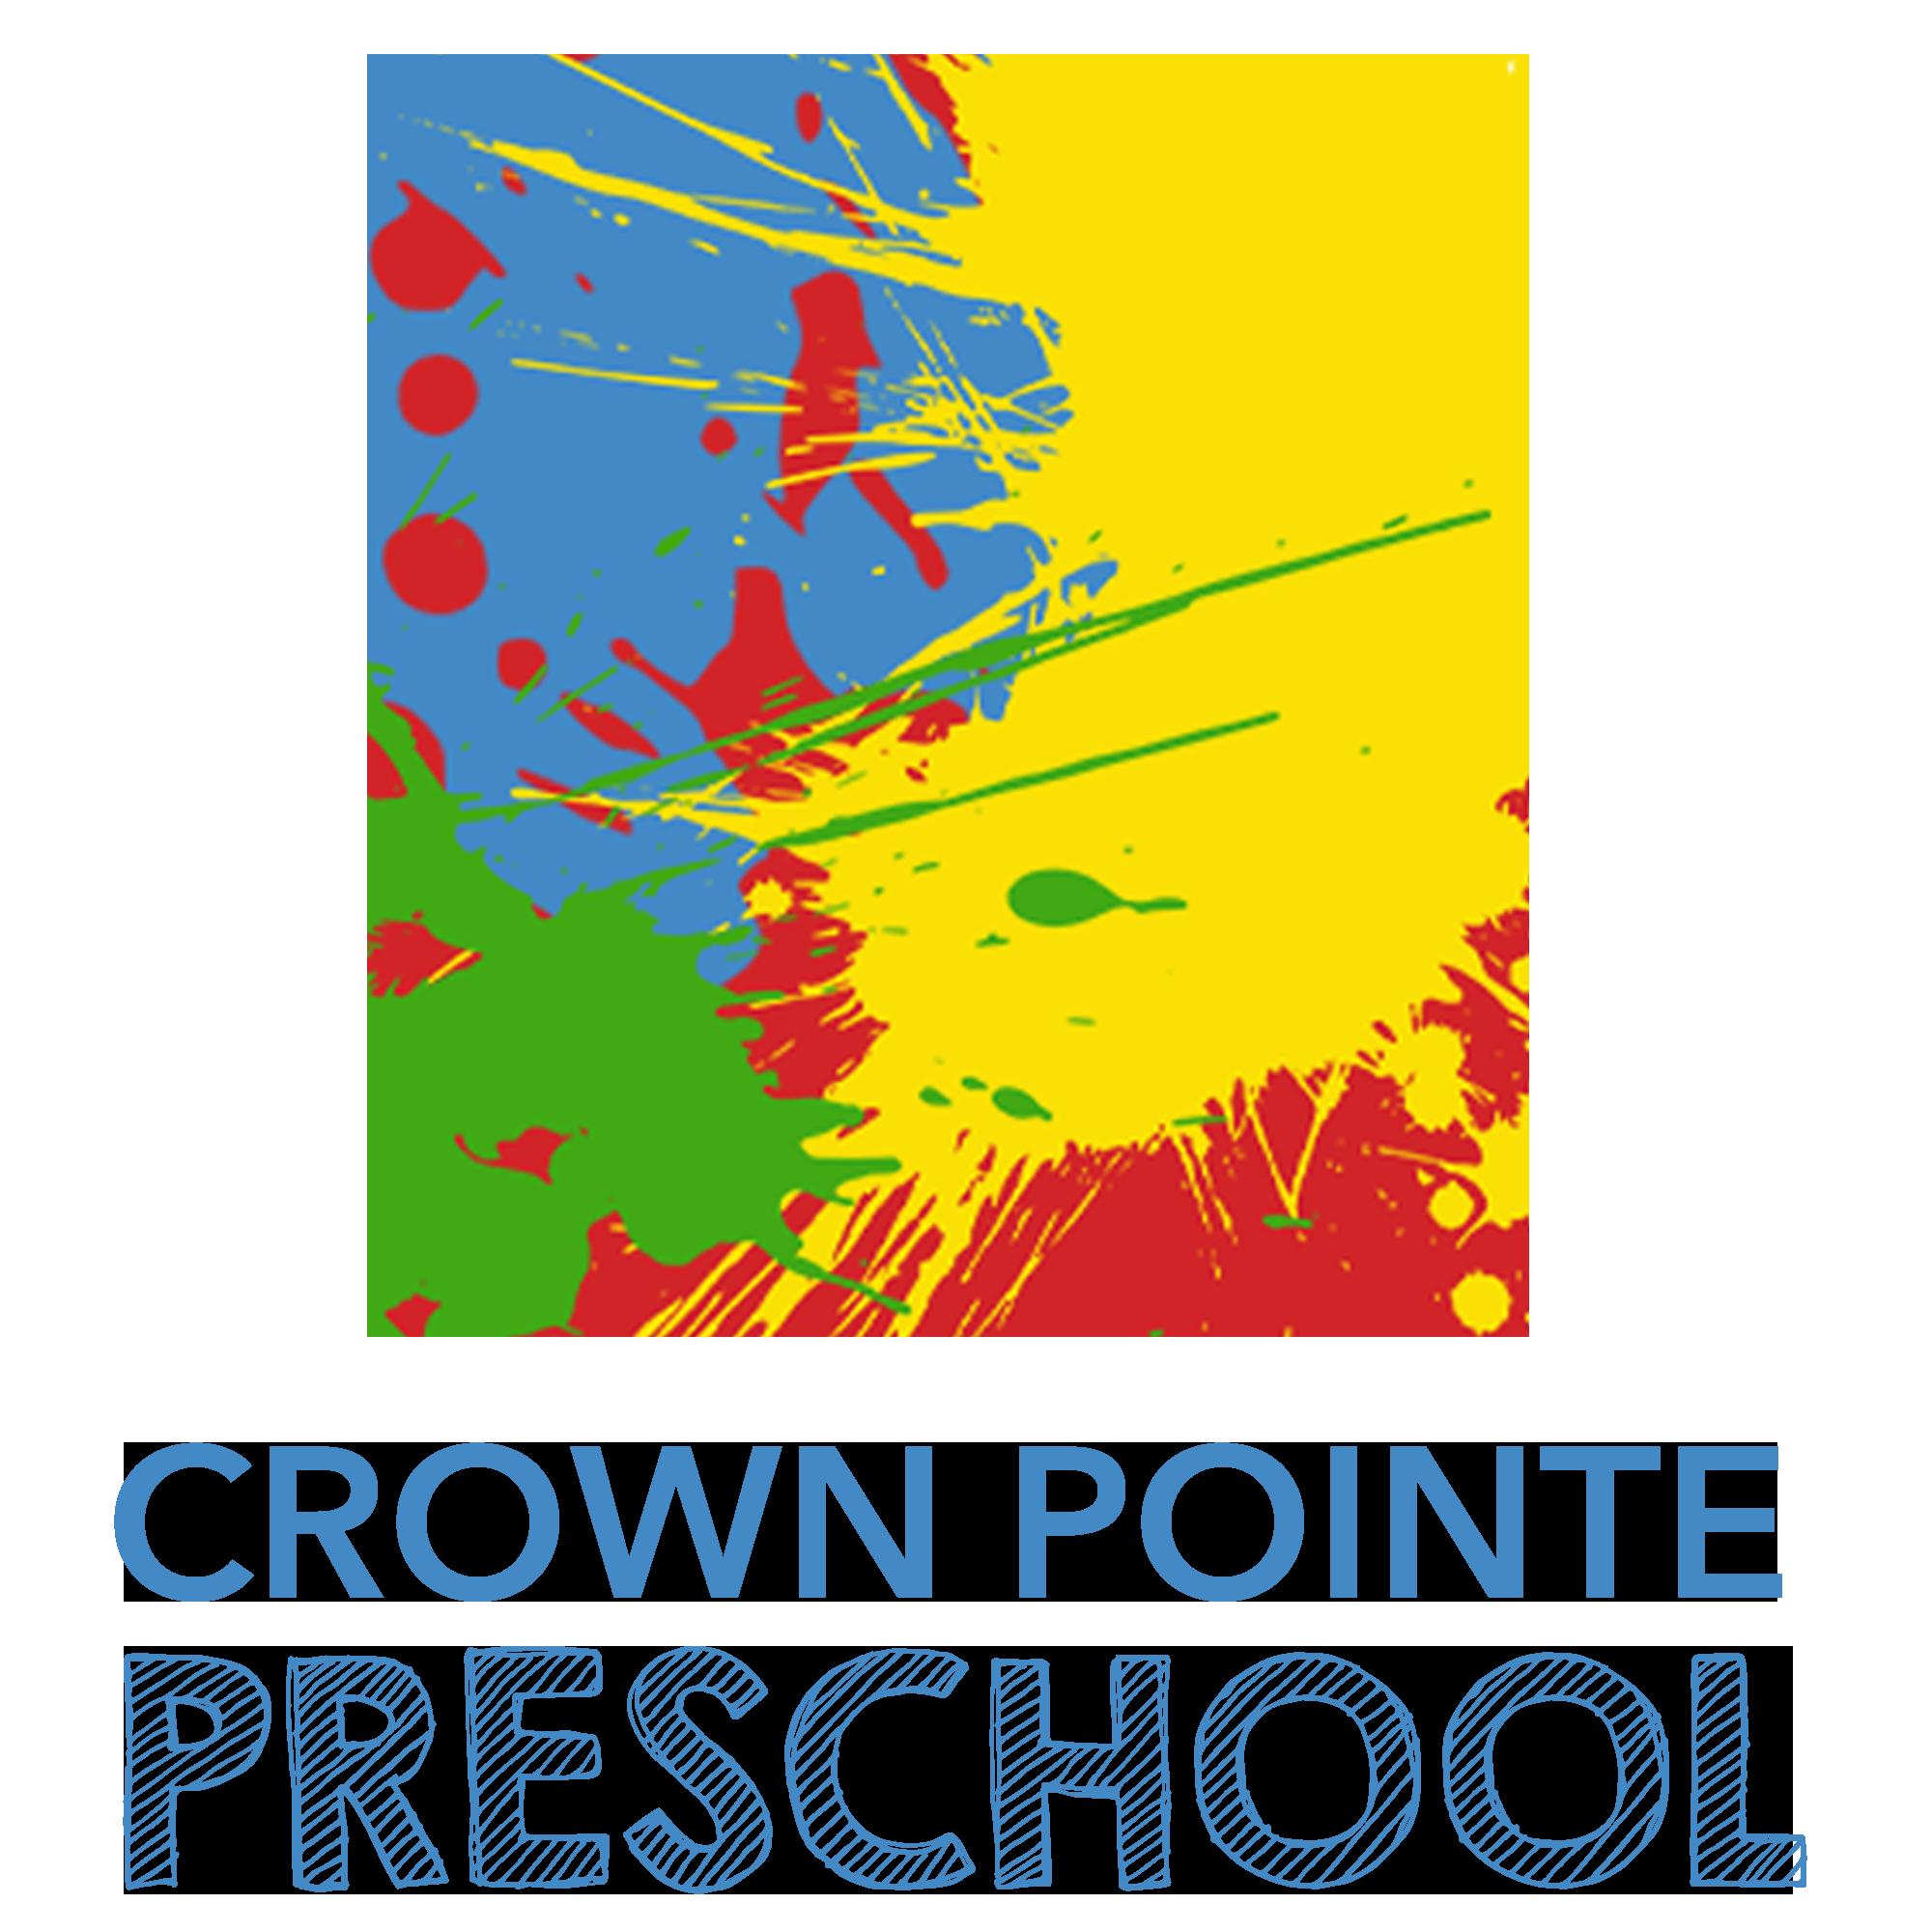 Preschool logo